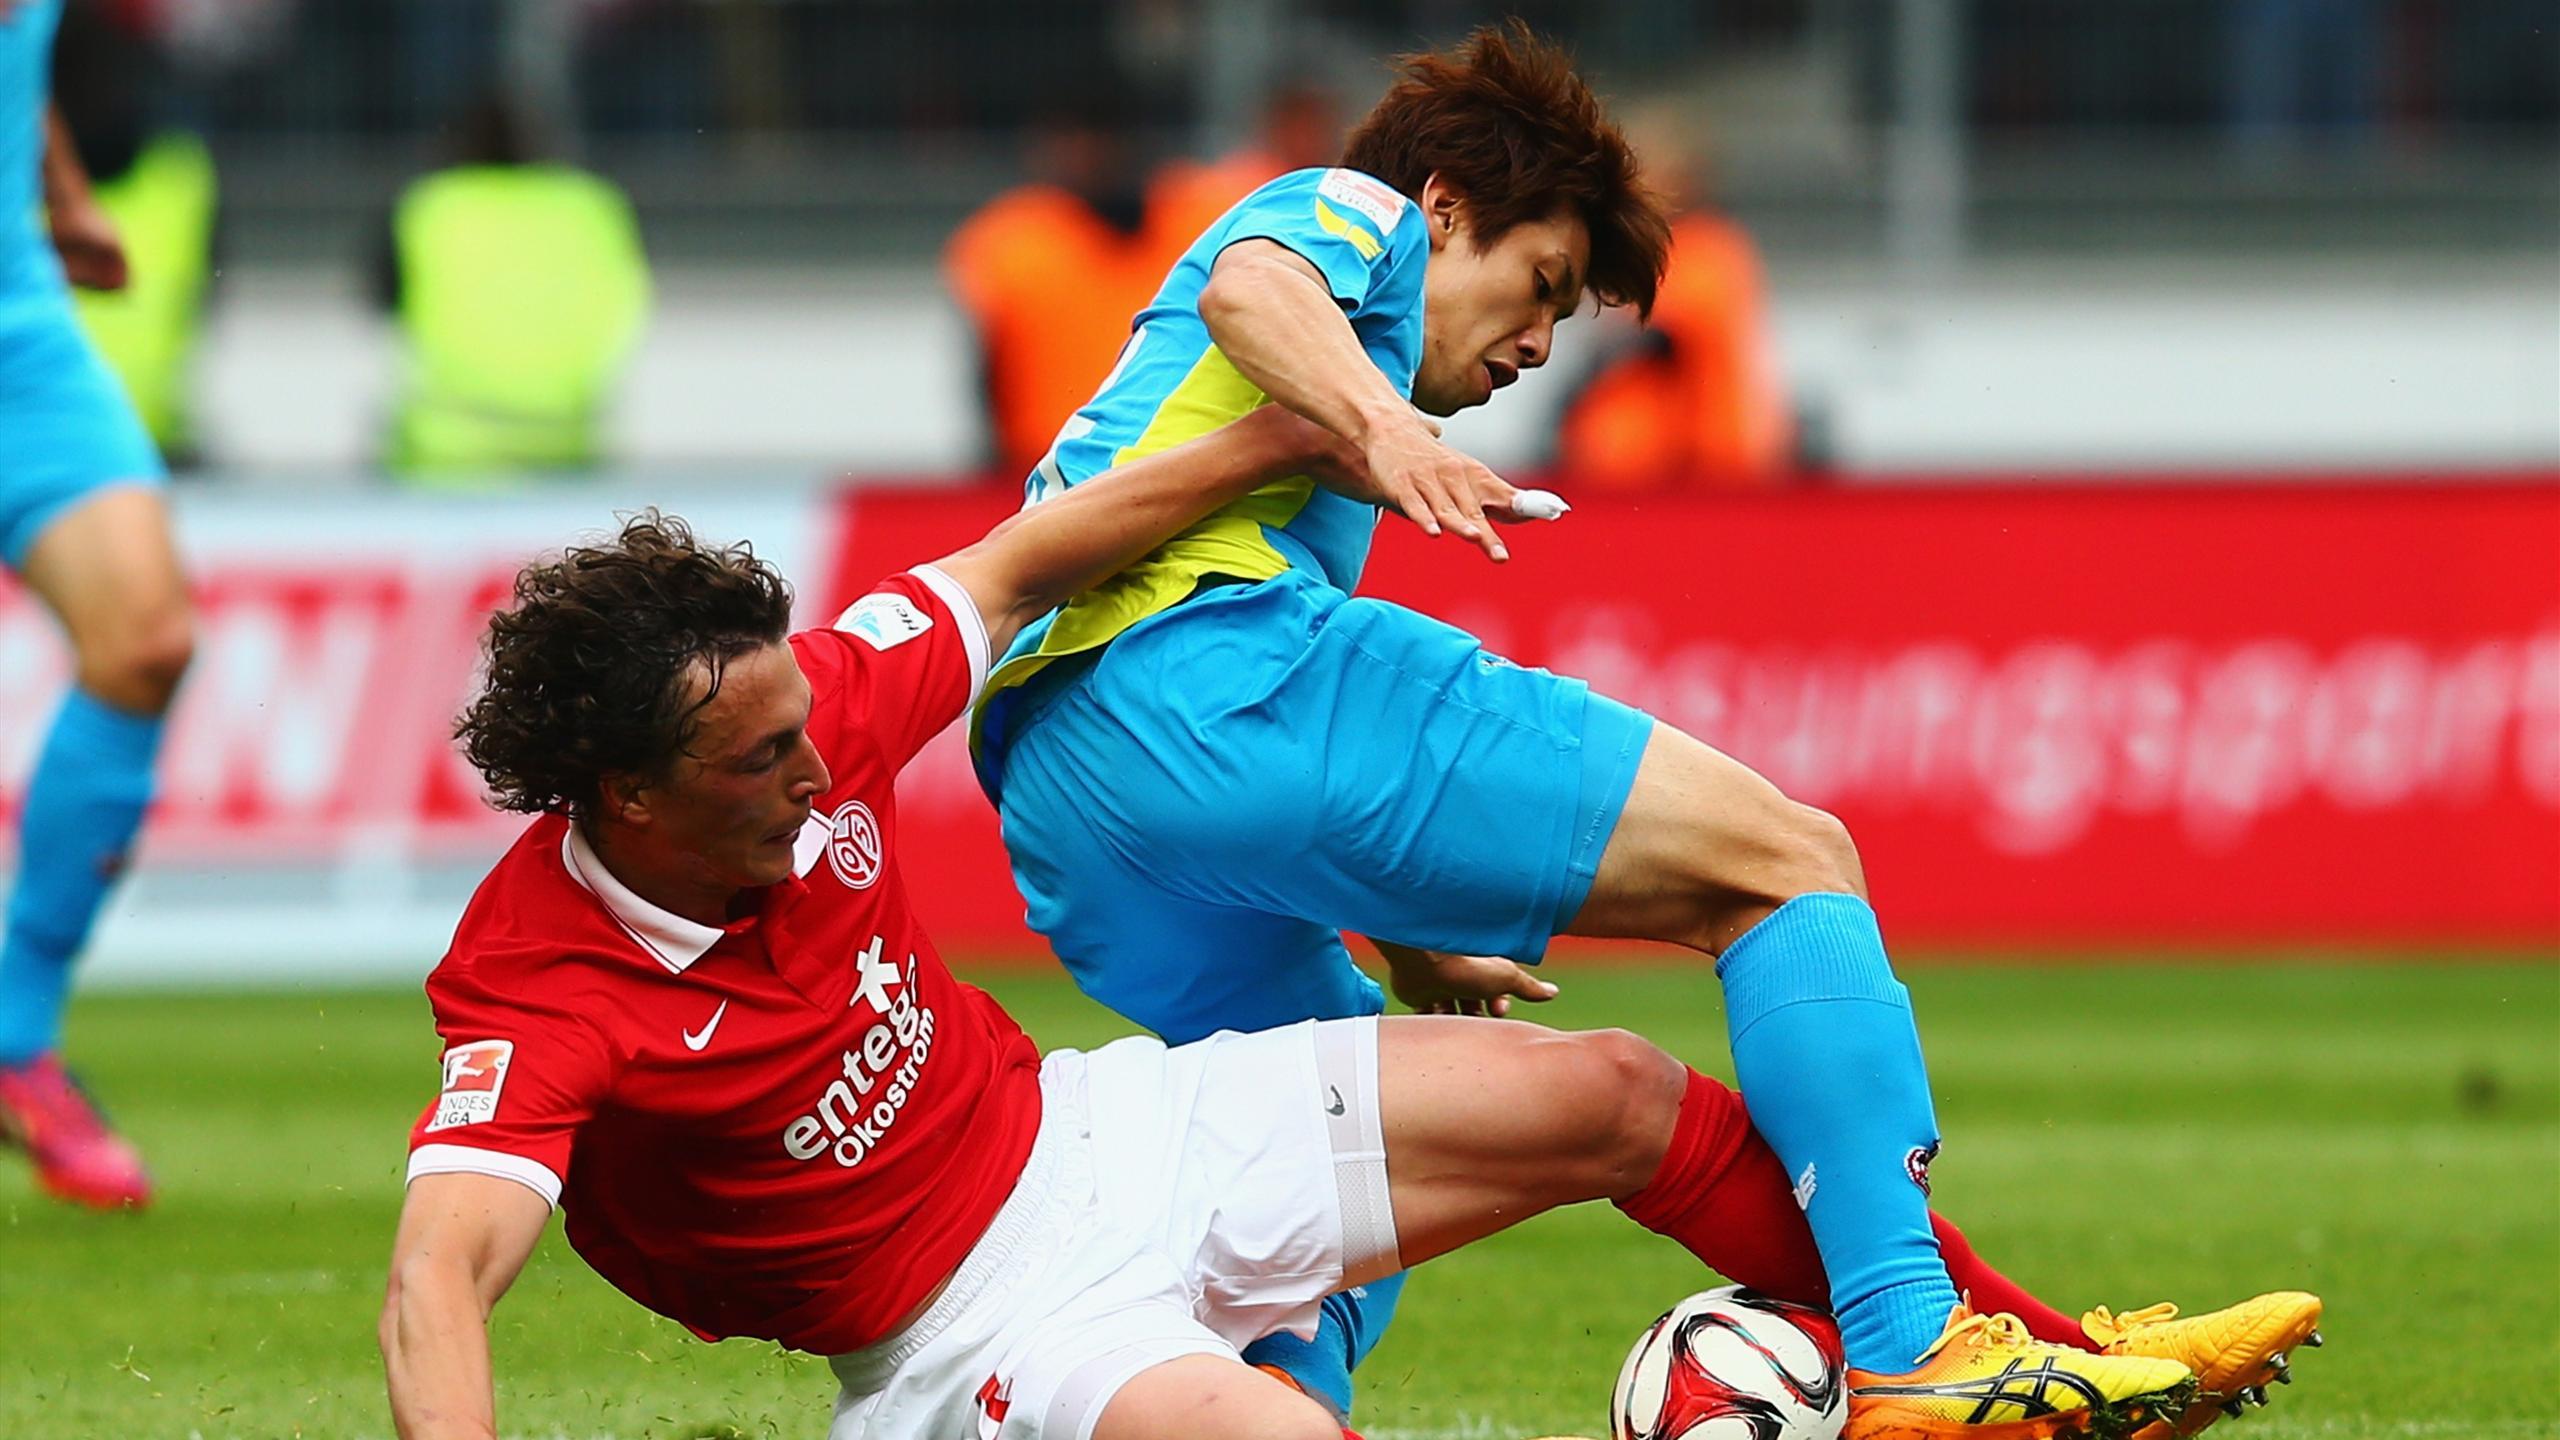 Video: Mainz 05 vs Cologne